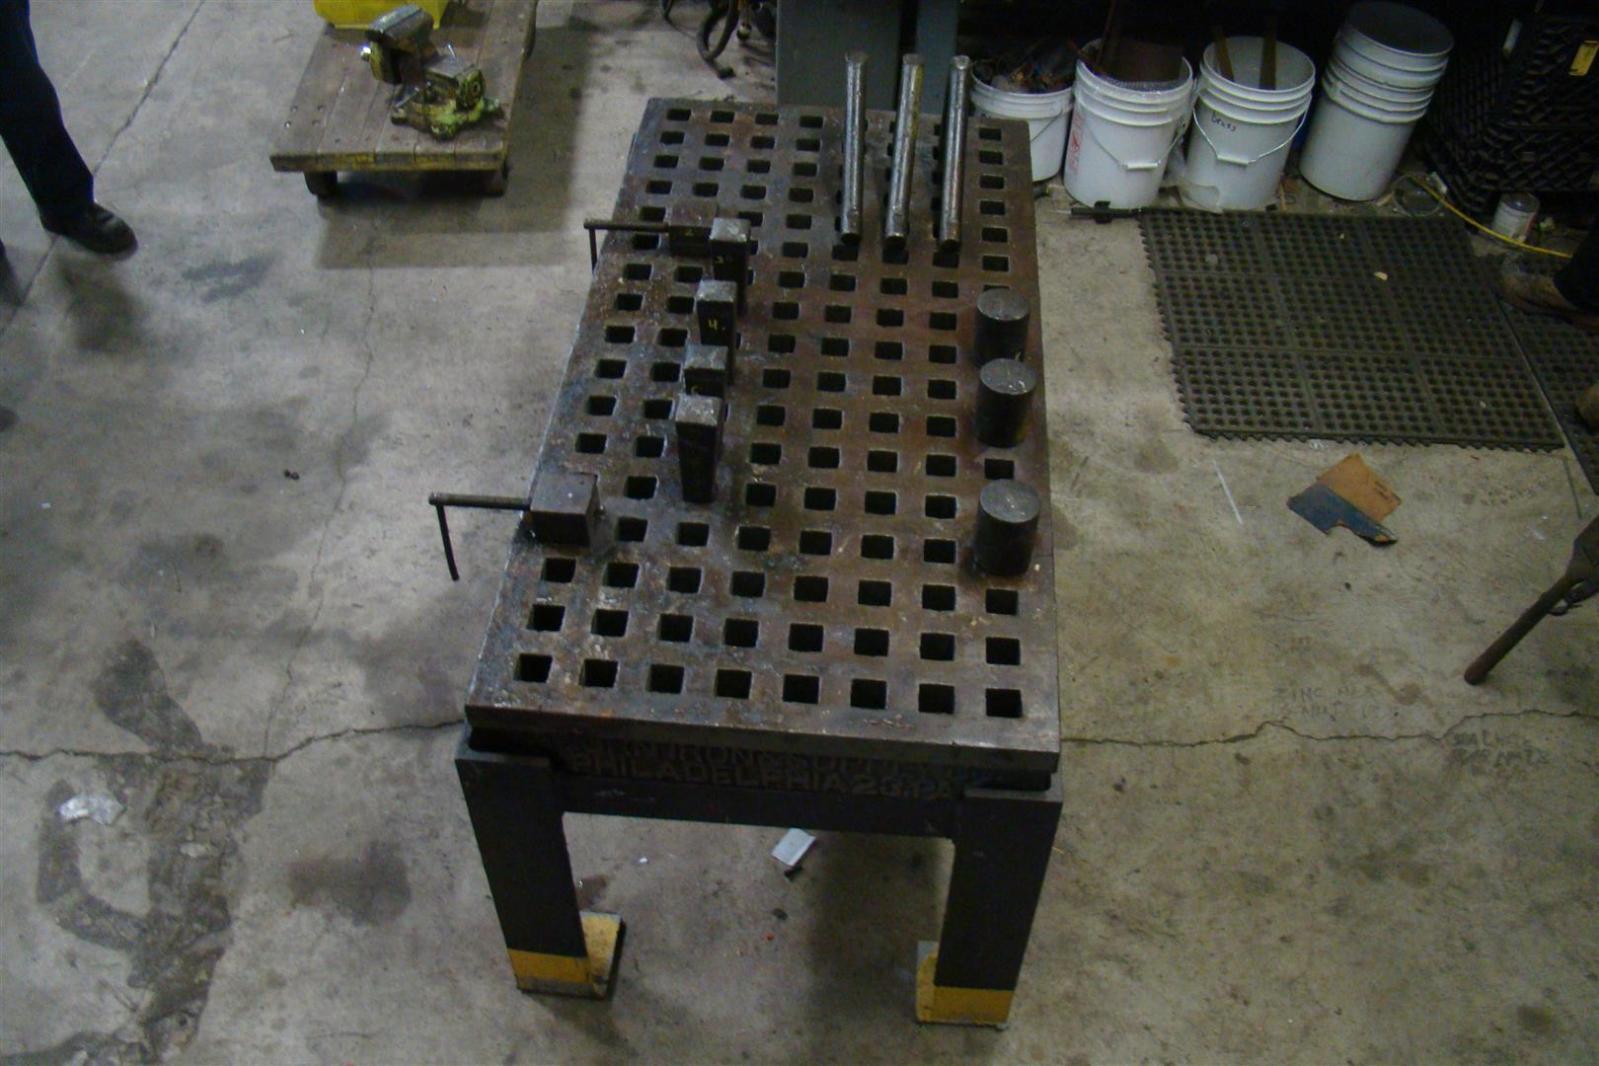 acorn welding platen layout table 60